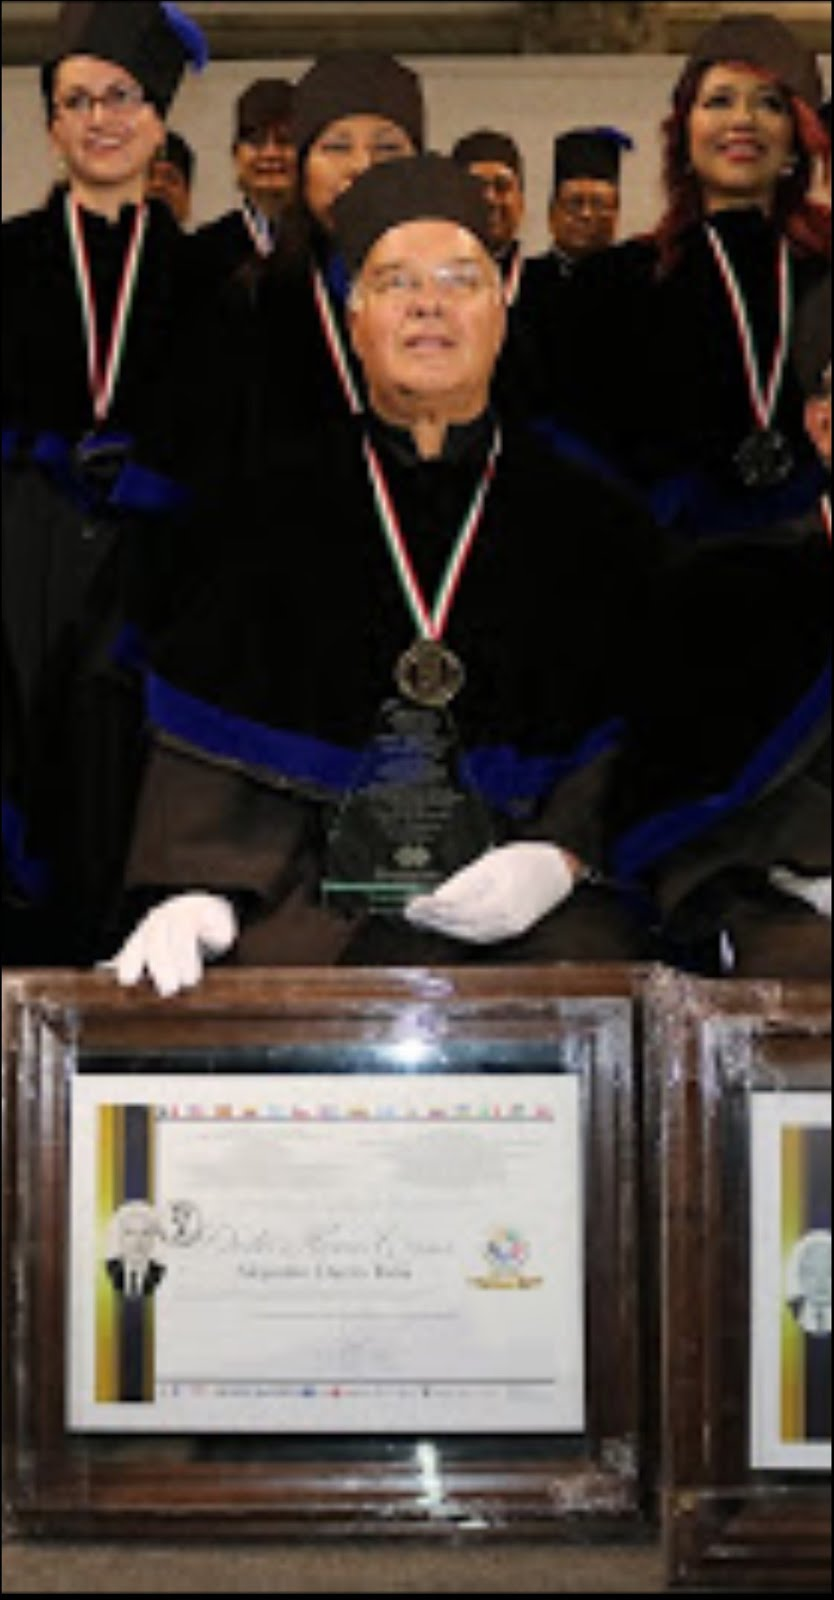 Doctorado Honoris Causa a Alejandro Durán